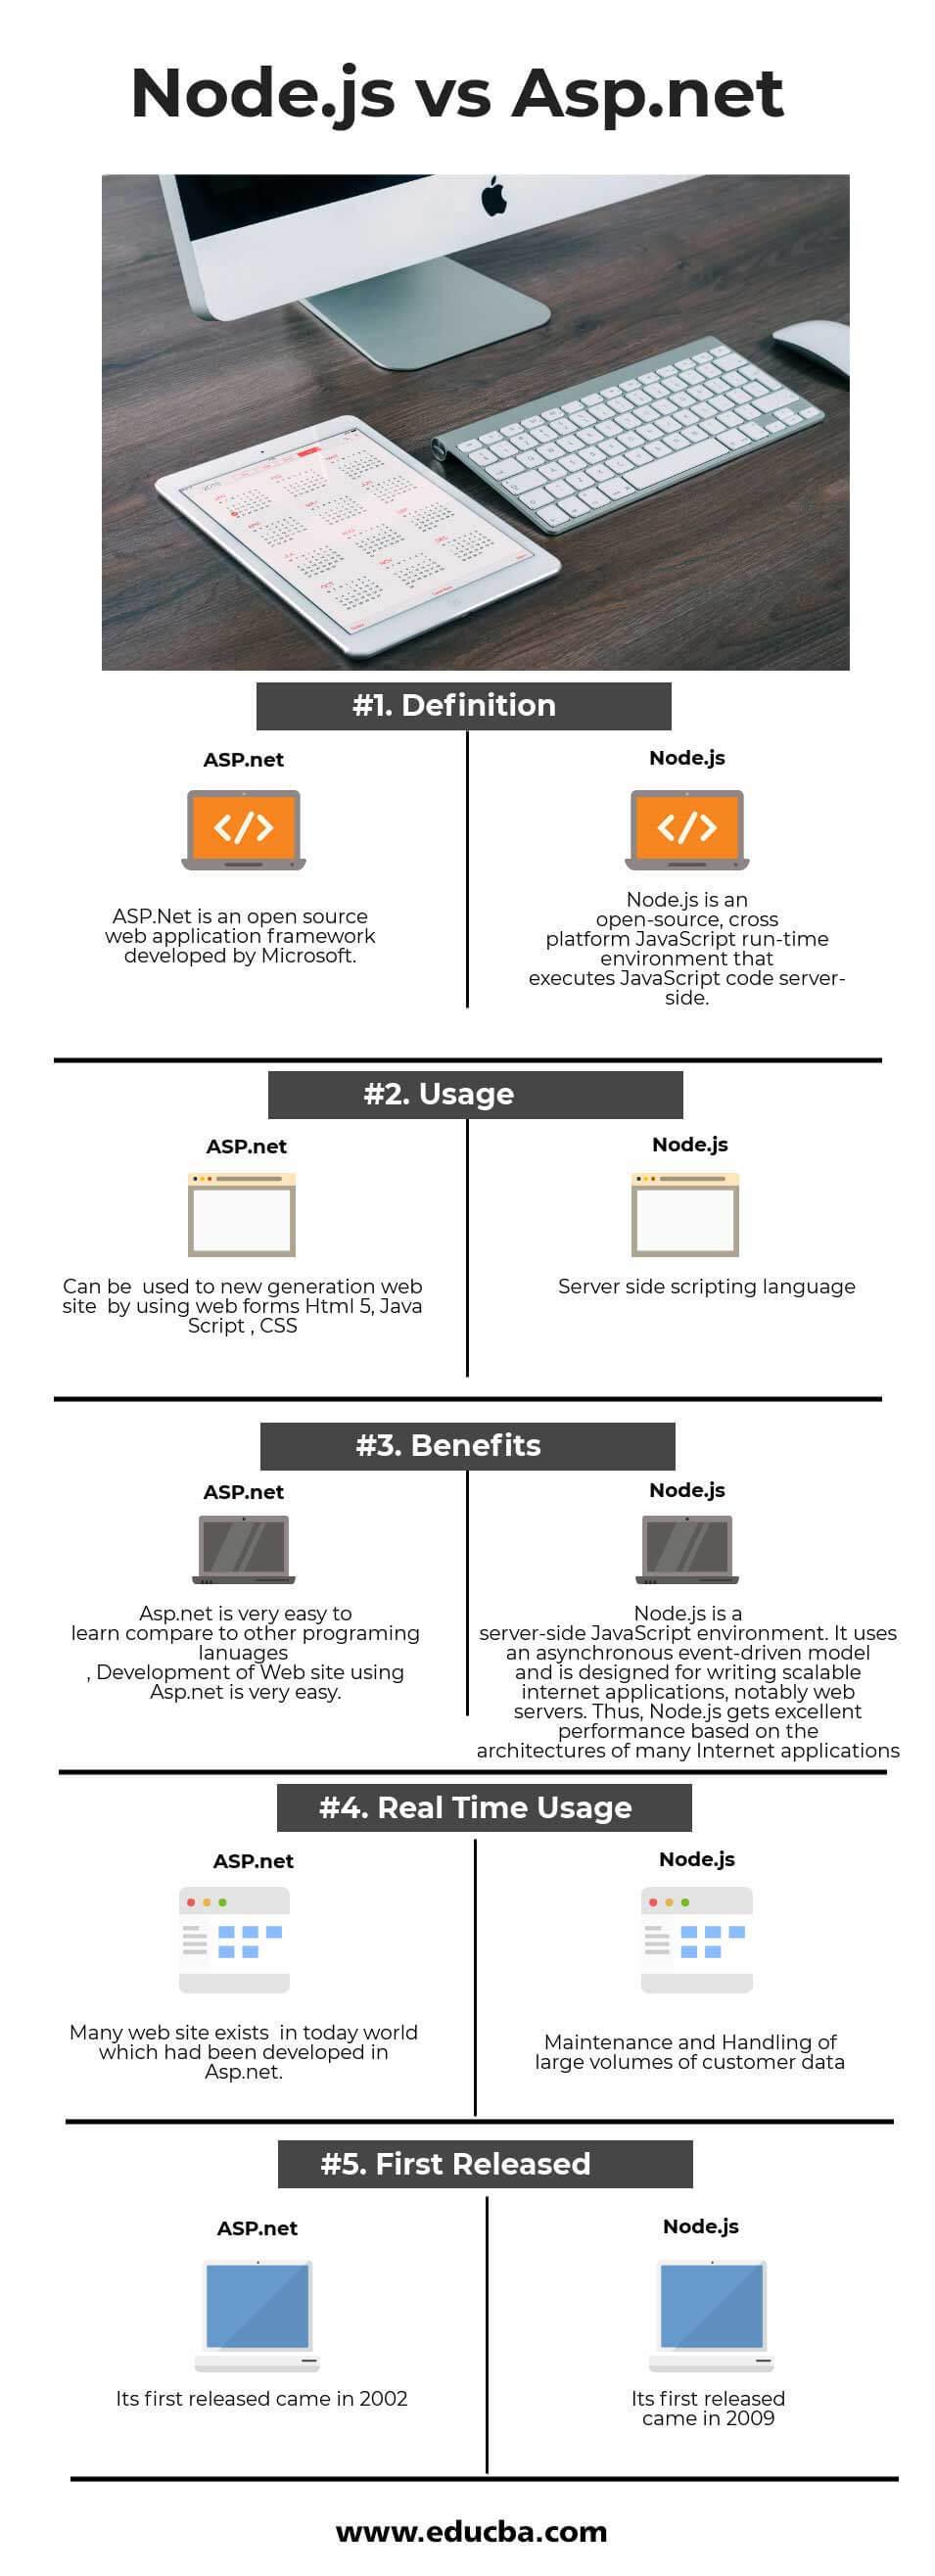 Node js vs Asp net - Find Out The 5 Best Differences